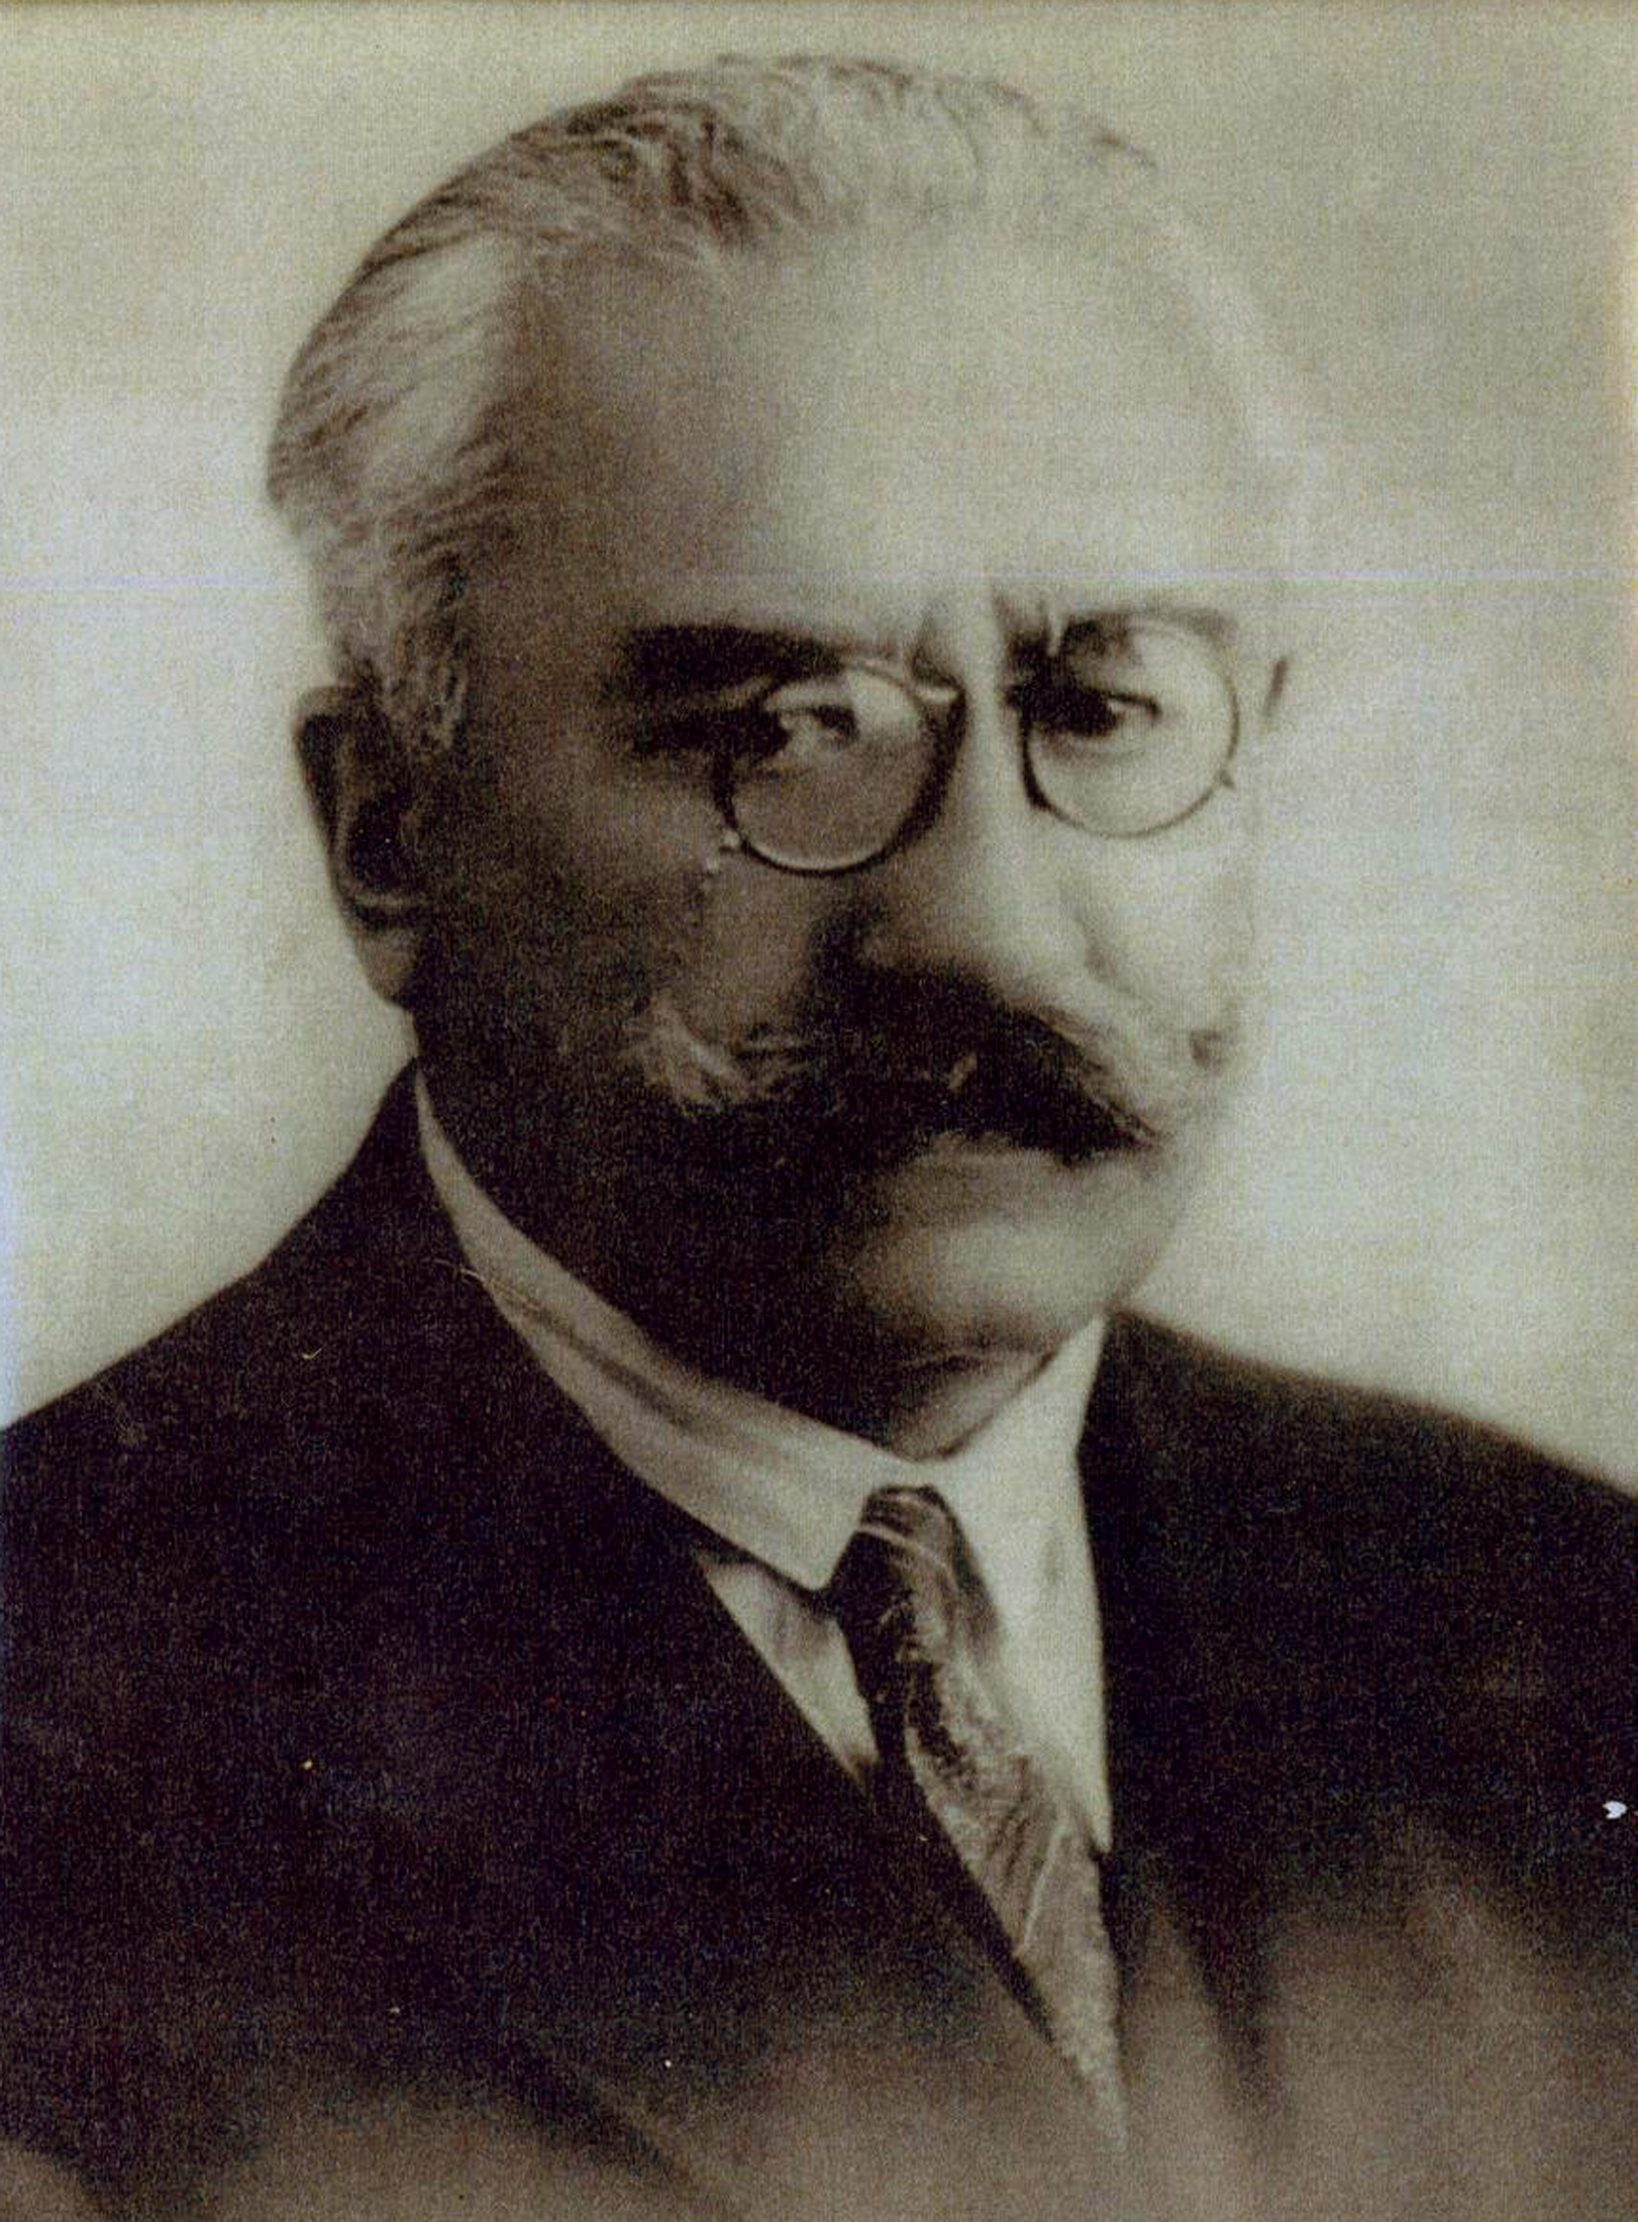 Alexandru Vaida-Voevod (1872-1950)